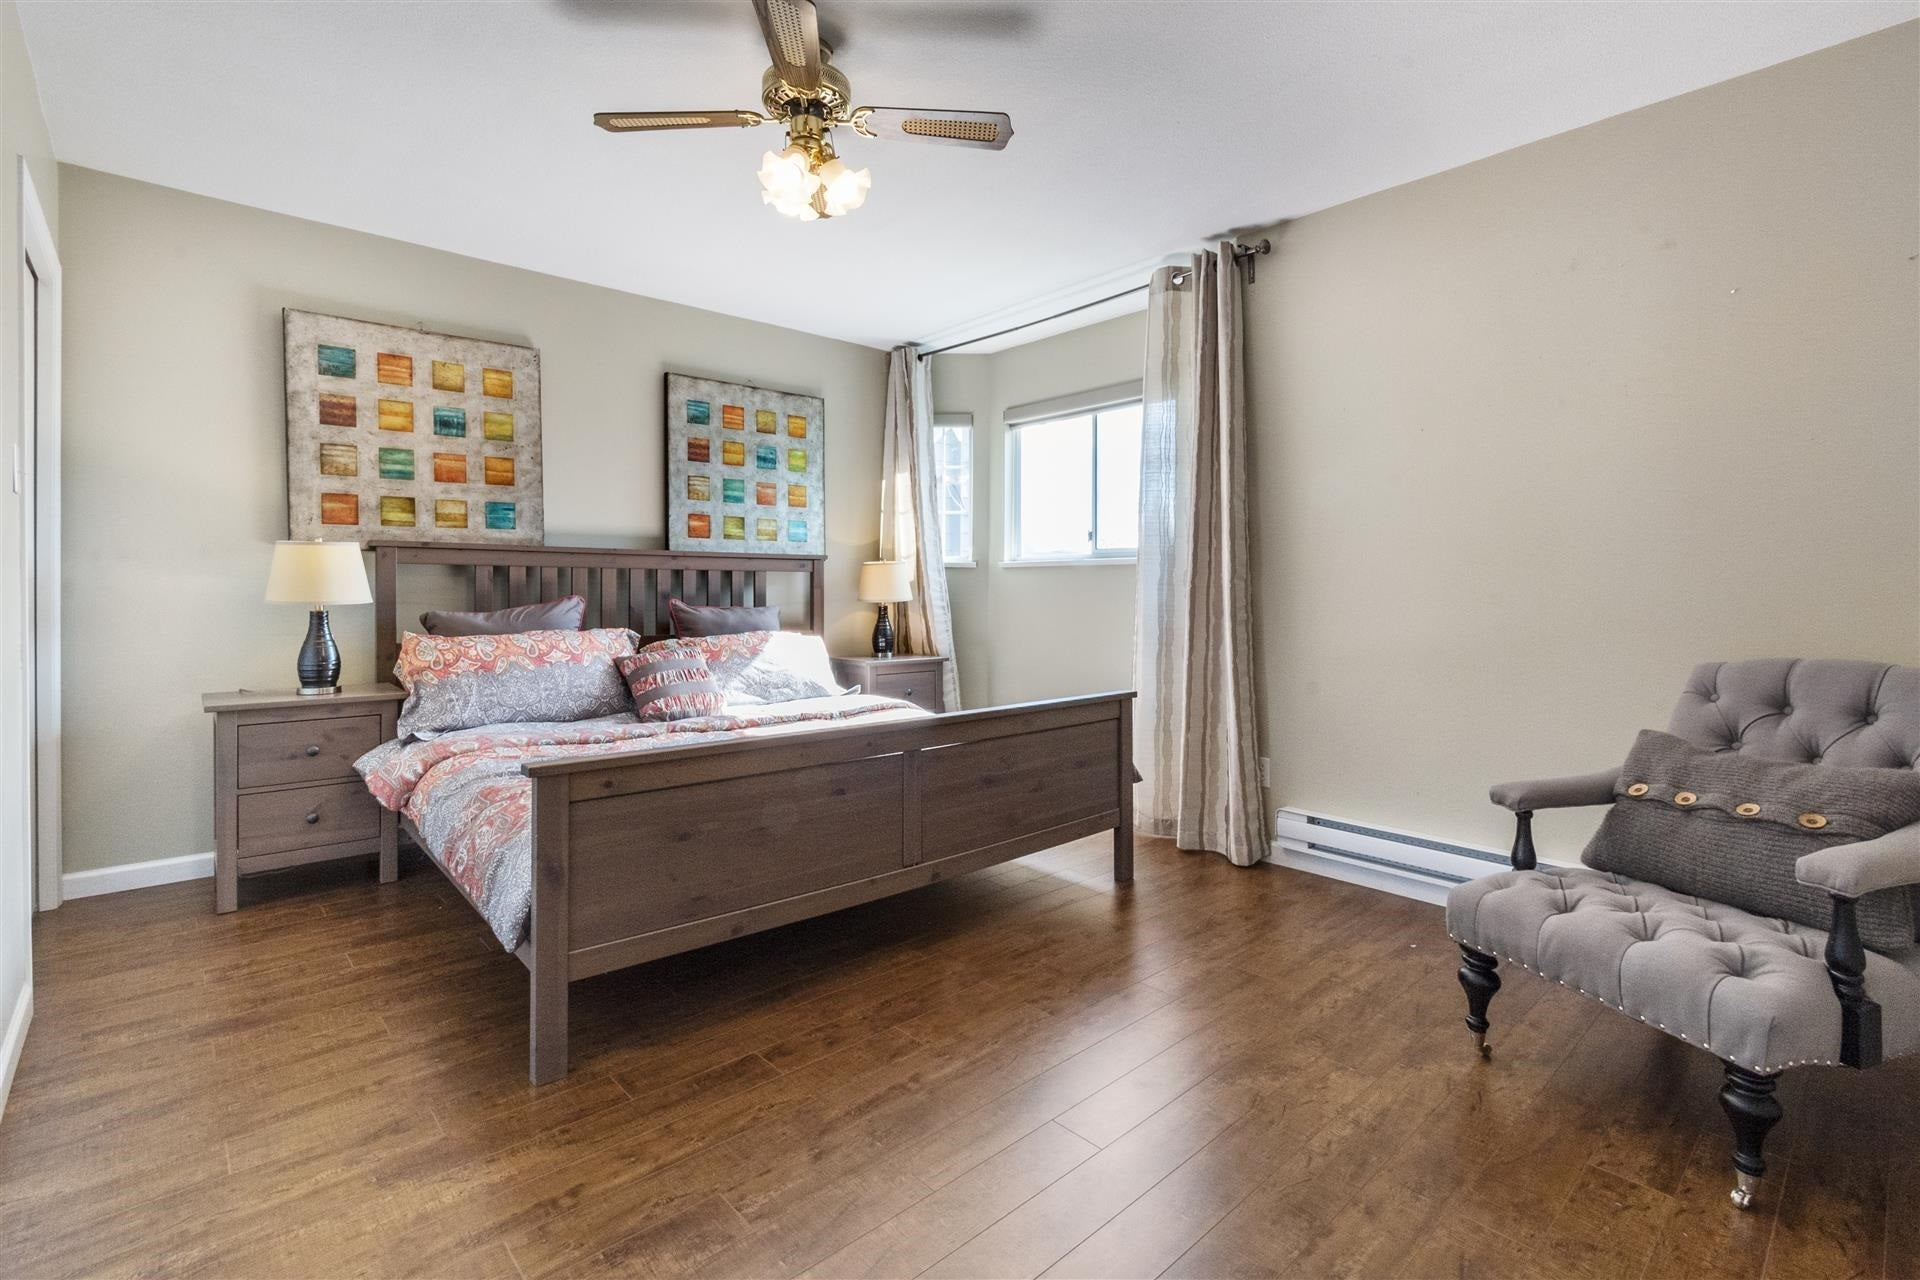 3631 GEORGIA STREET - Steveston Village House/Single Family for sale, 3 Bedrooms (R2623894) - #13